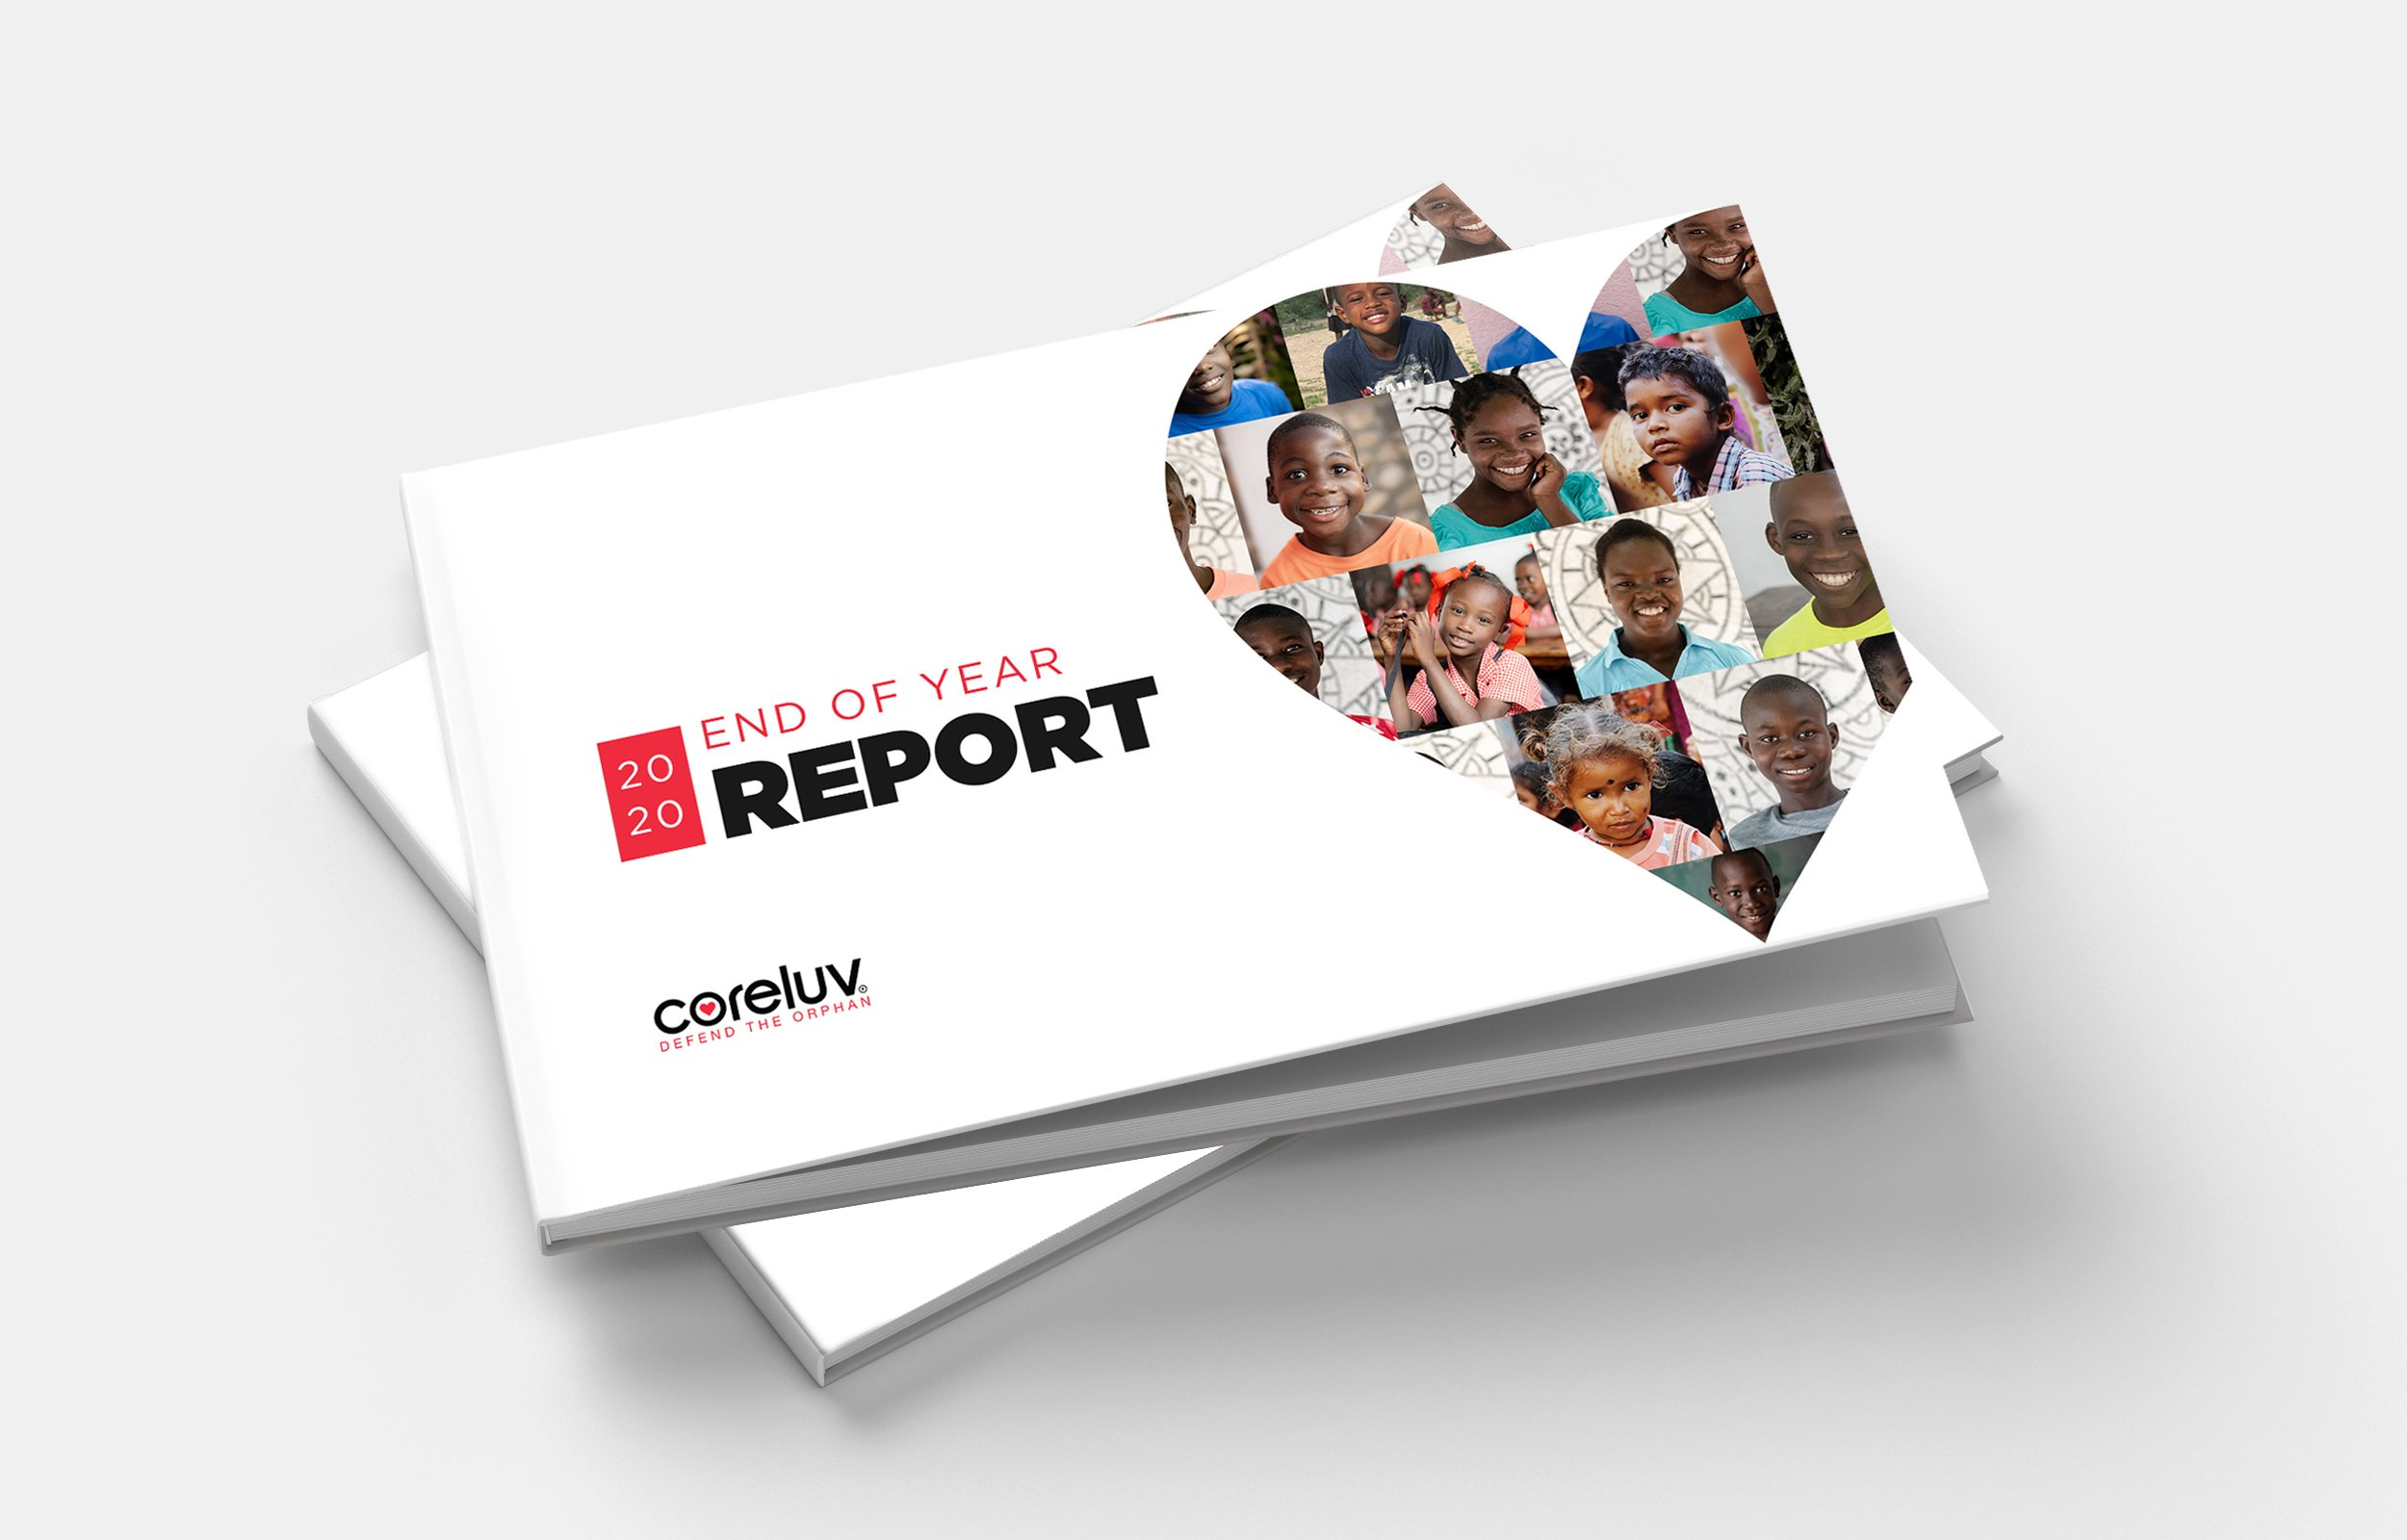 Coreluv Annual Report 2020